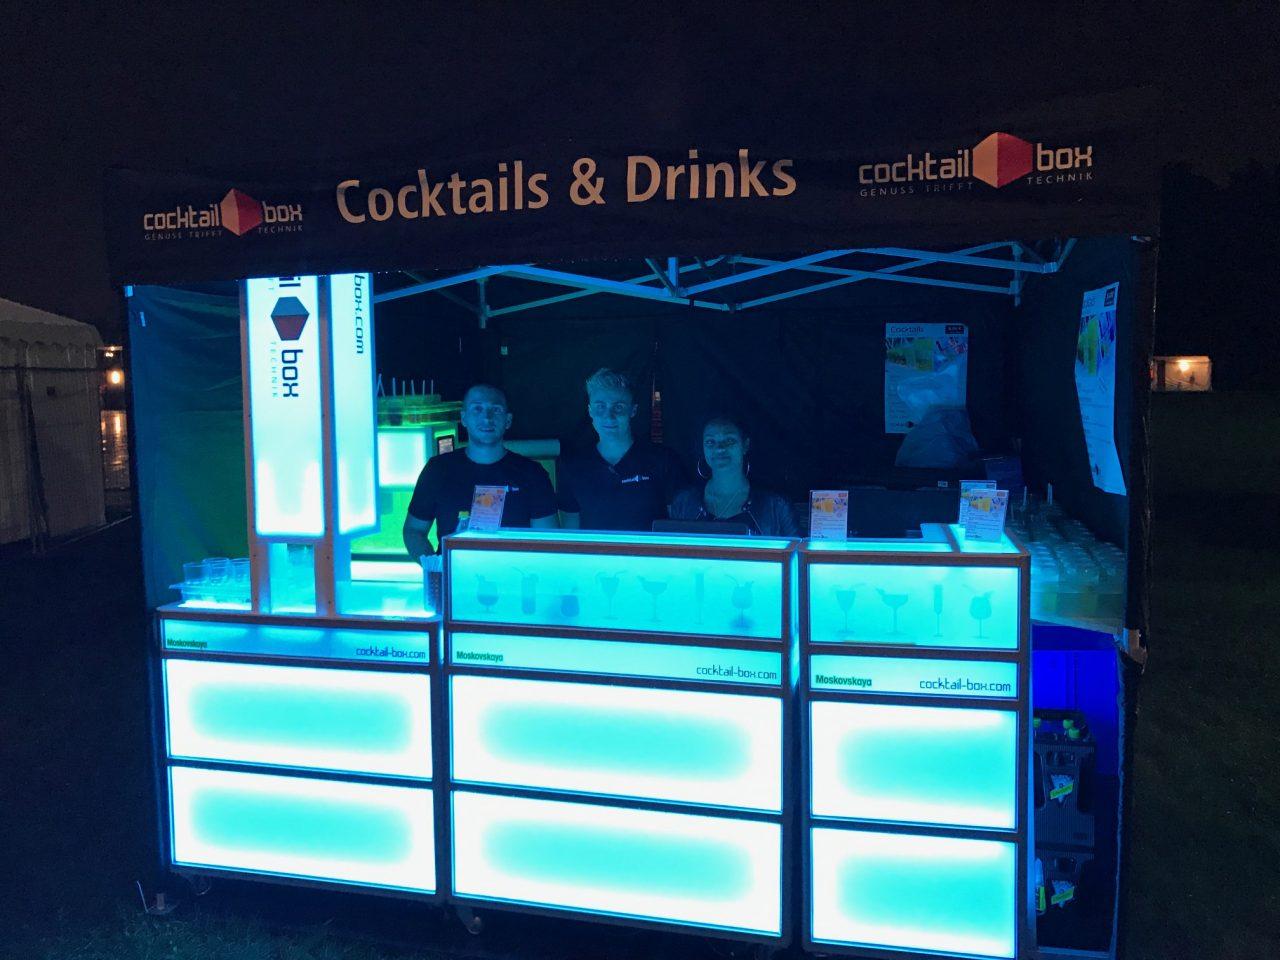 OlympiastadionBerlin_U2_cocktail-box_3